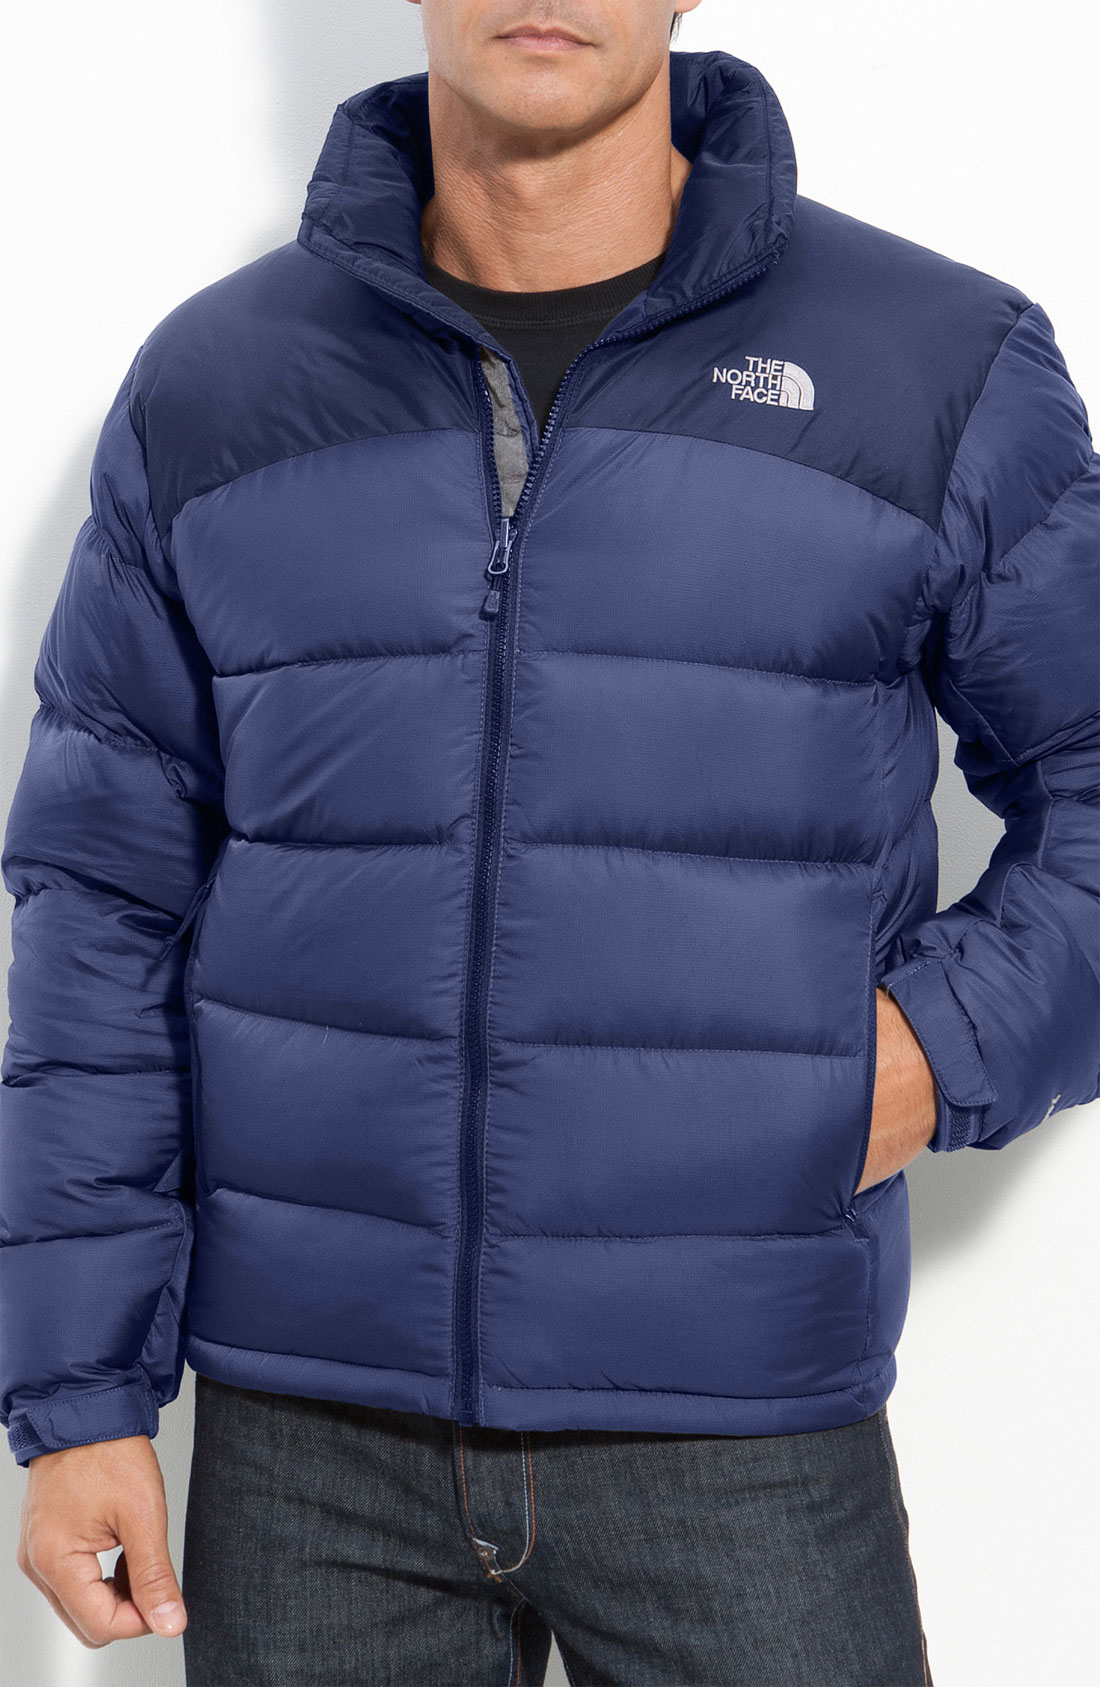 the north face nuptse 2 down jacket in blue for men lyst. Black Bedroom Furniture Sets. Home Design Ideas